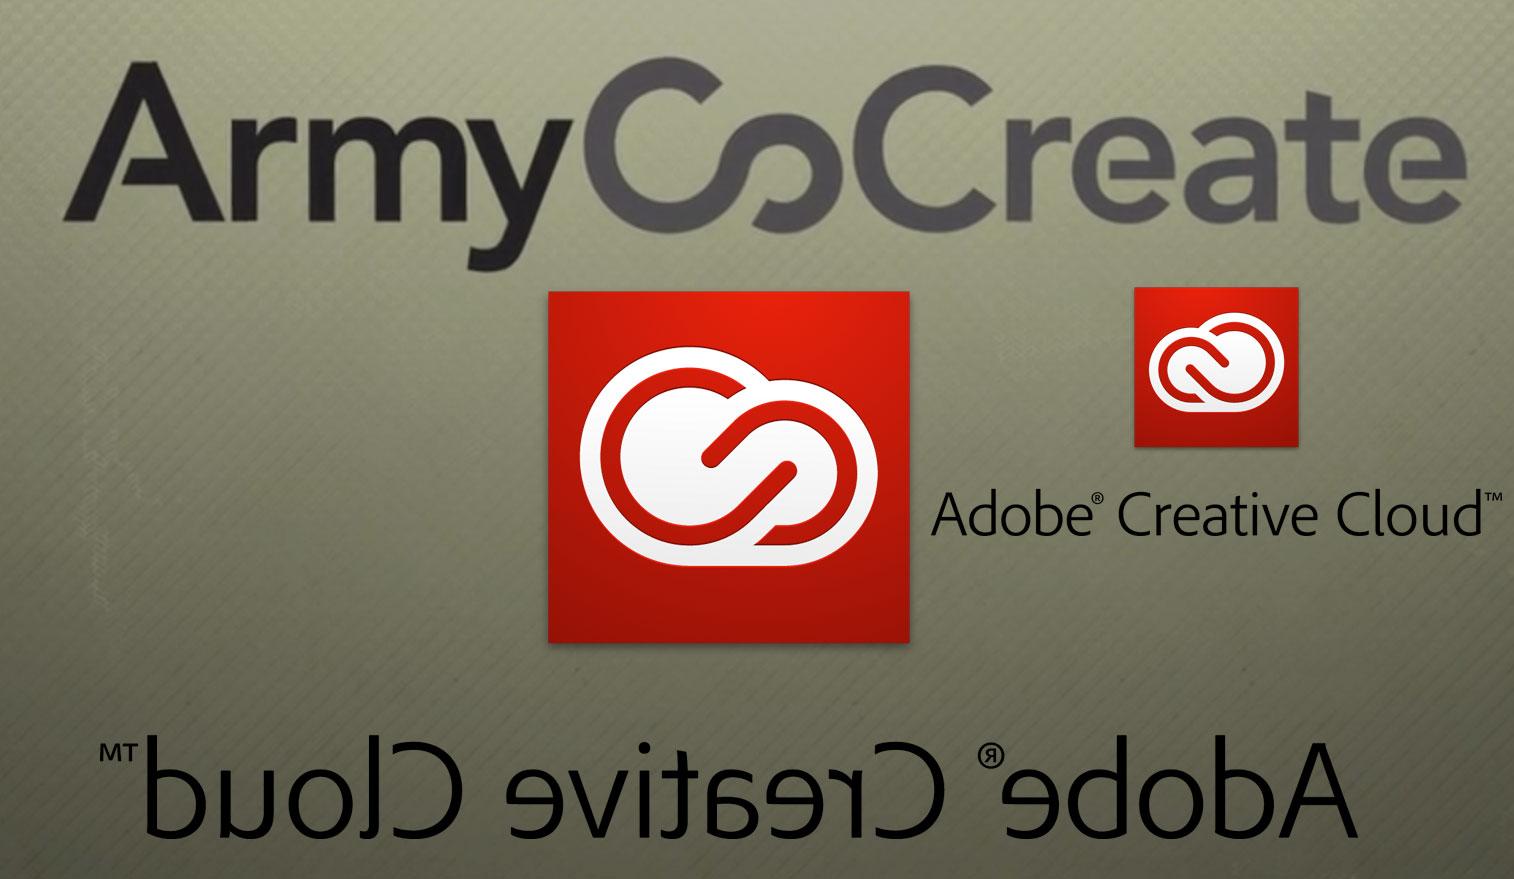 Adobe-Creative-Cloud-Army-Co-Create